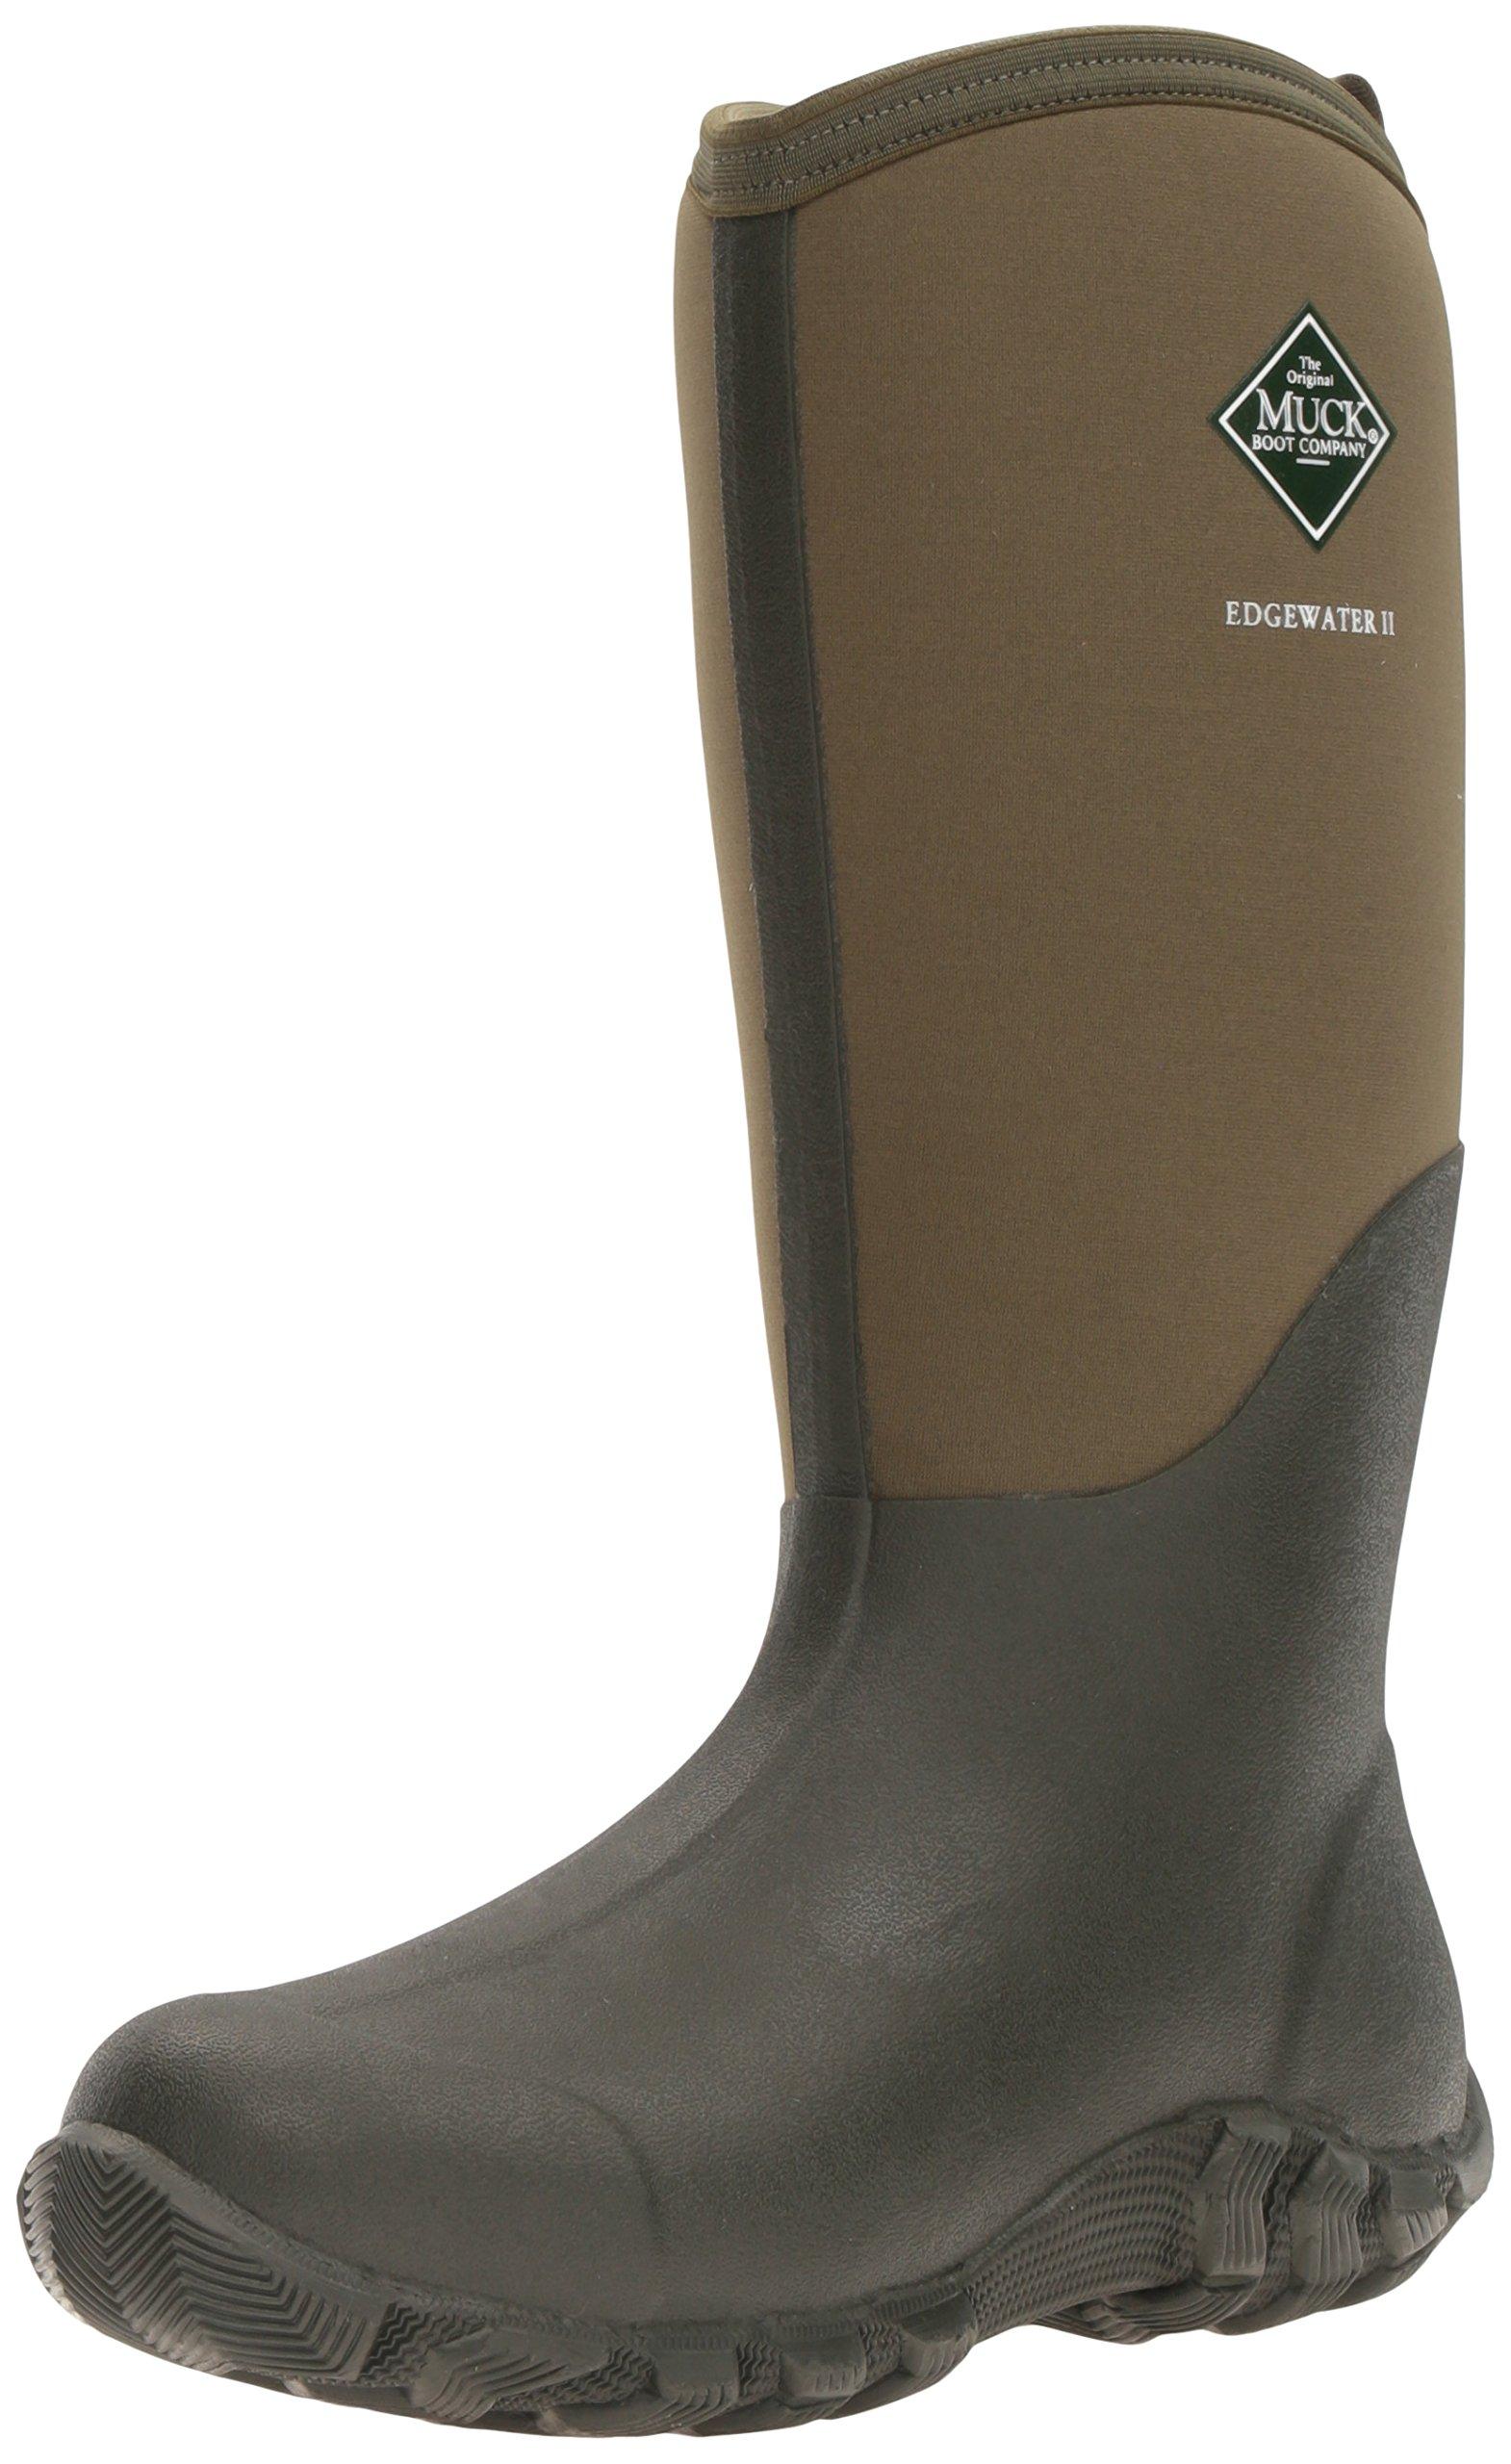 Muck Edgewater ll Multi-Purpose Tall Men's Rubber Boots